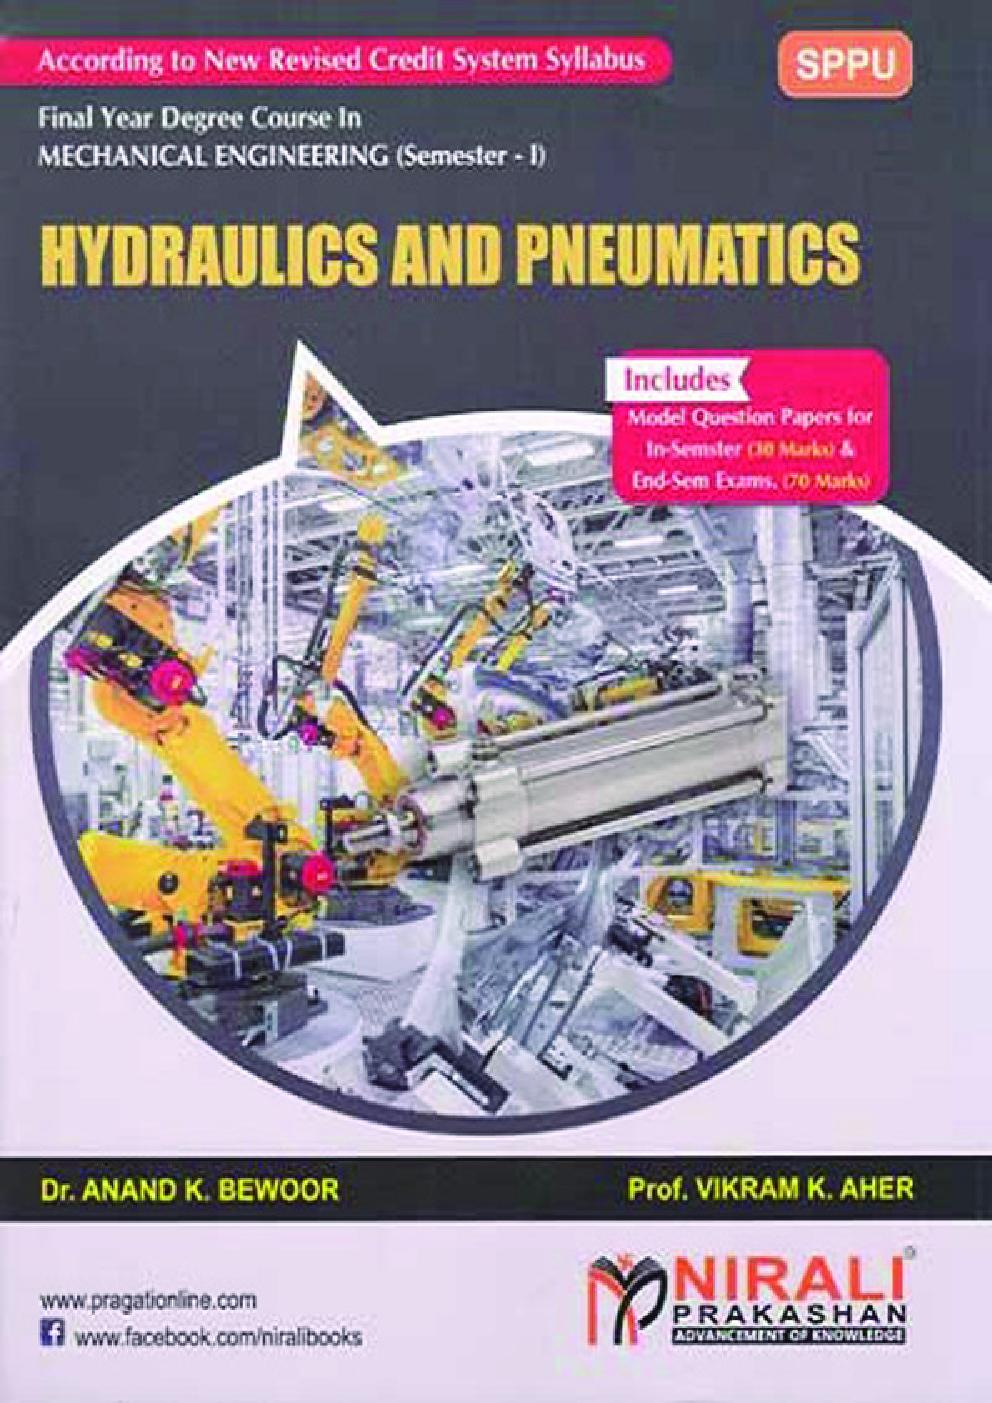 Hydraulics And Pneumatics - Page 1